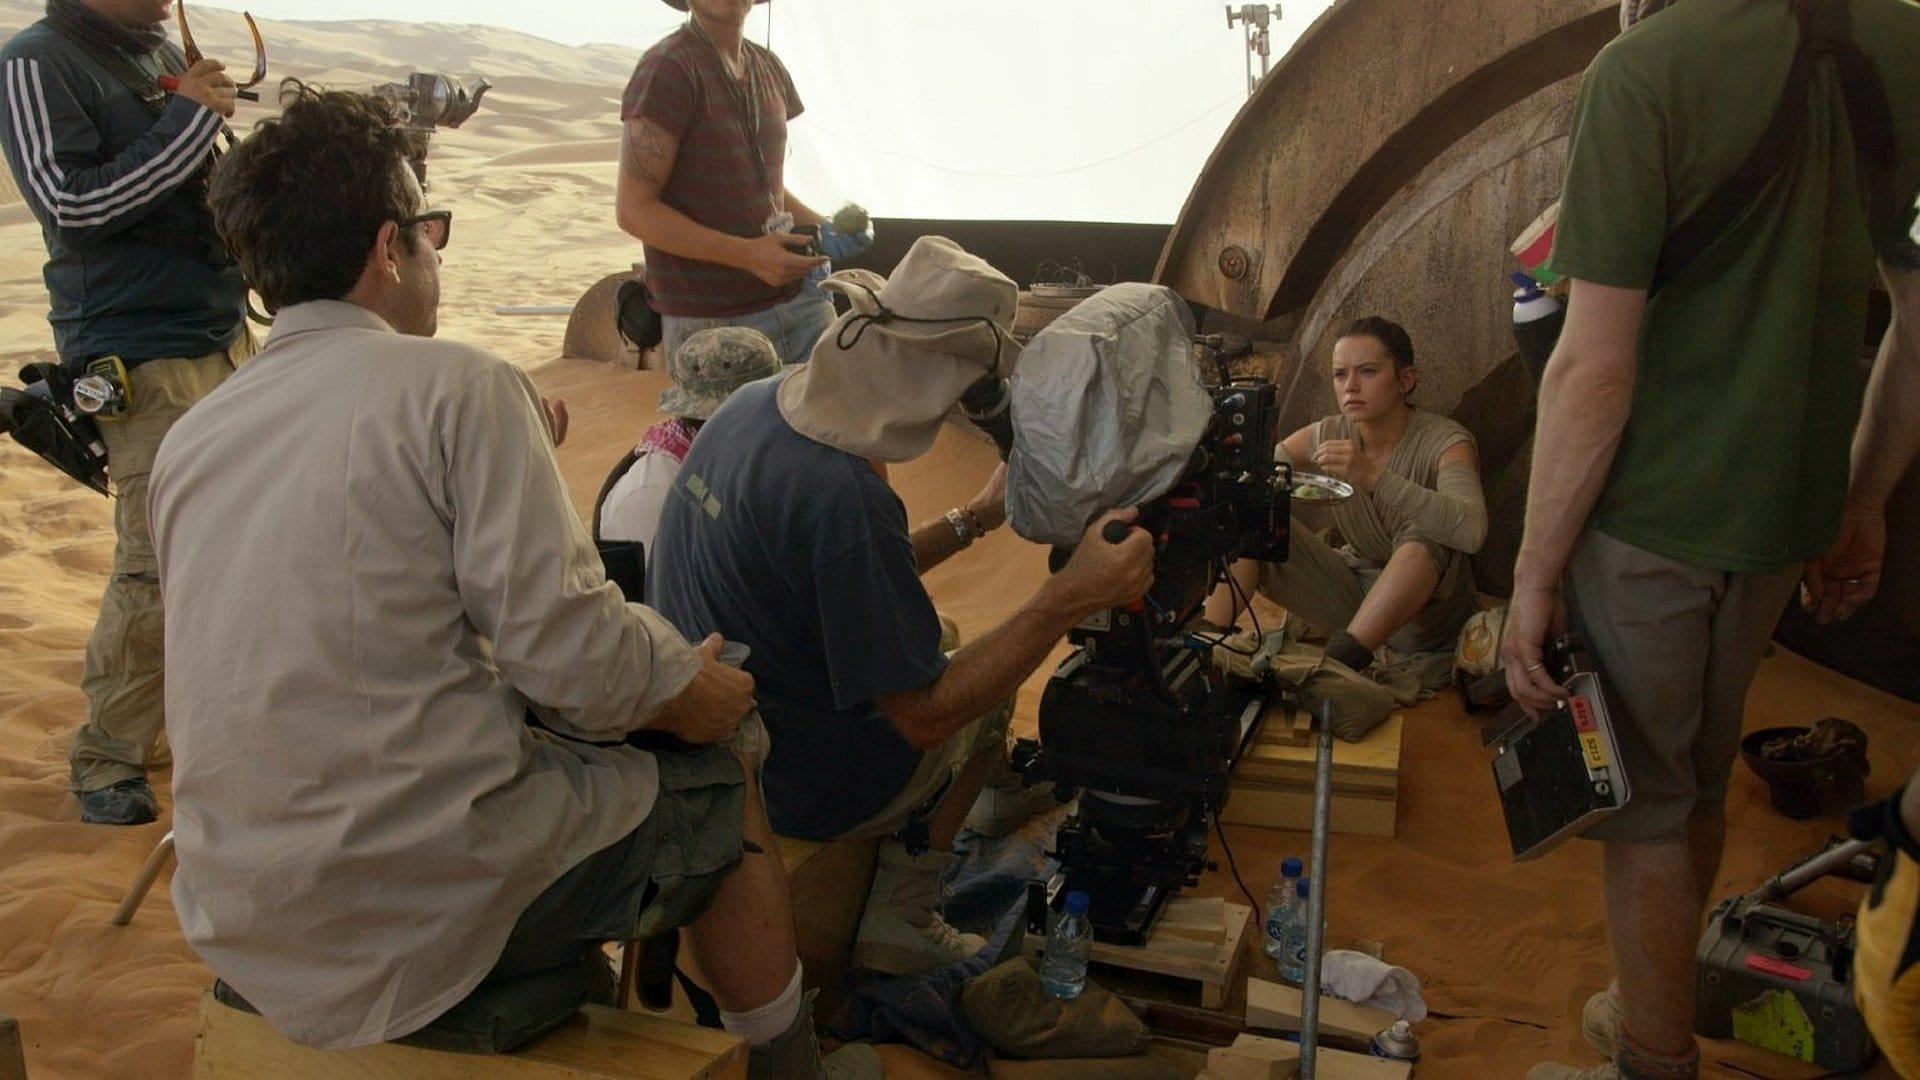 Regarder Secrets Of The Force Awakens – A Cinematic Journey en streaming gratuit